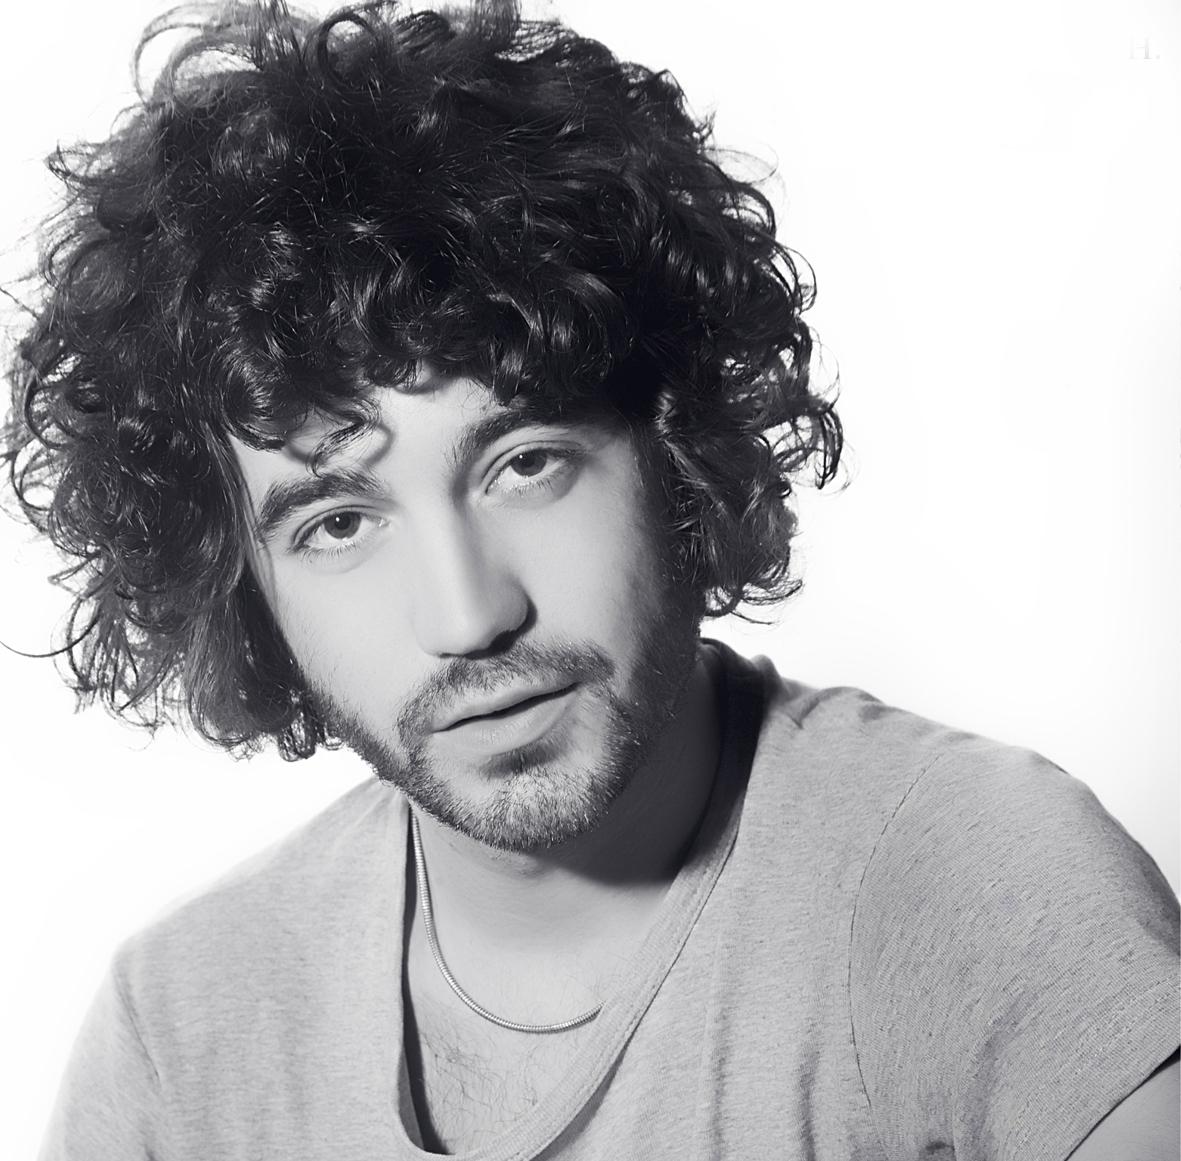 Jacopo-Lorenzini-Italian-director-fashion-news